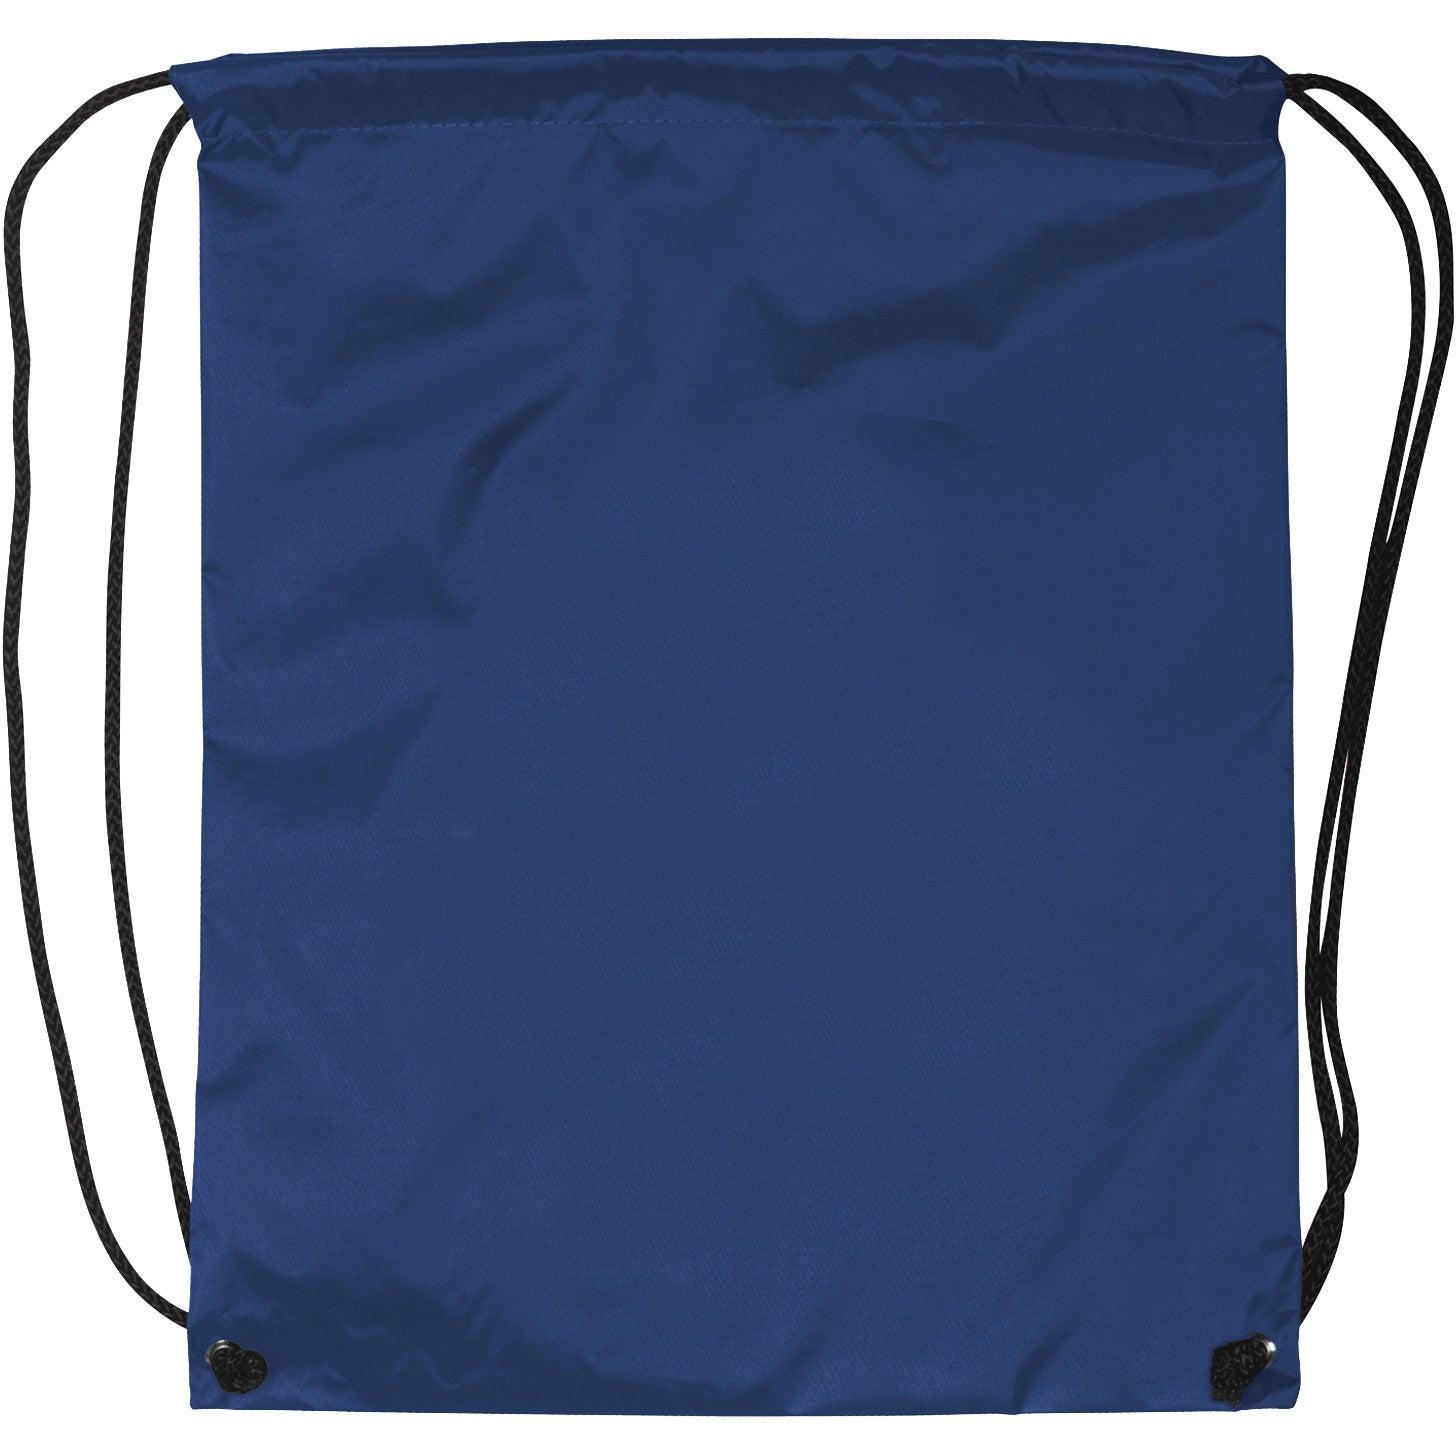 Nylon Drawstring Backpack 22